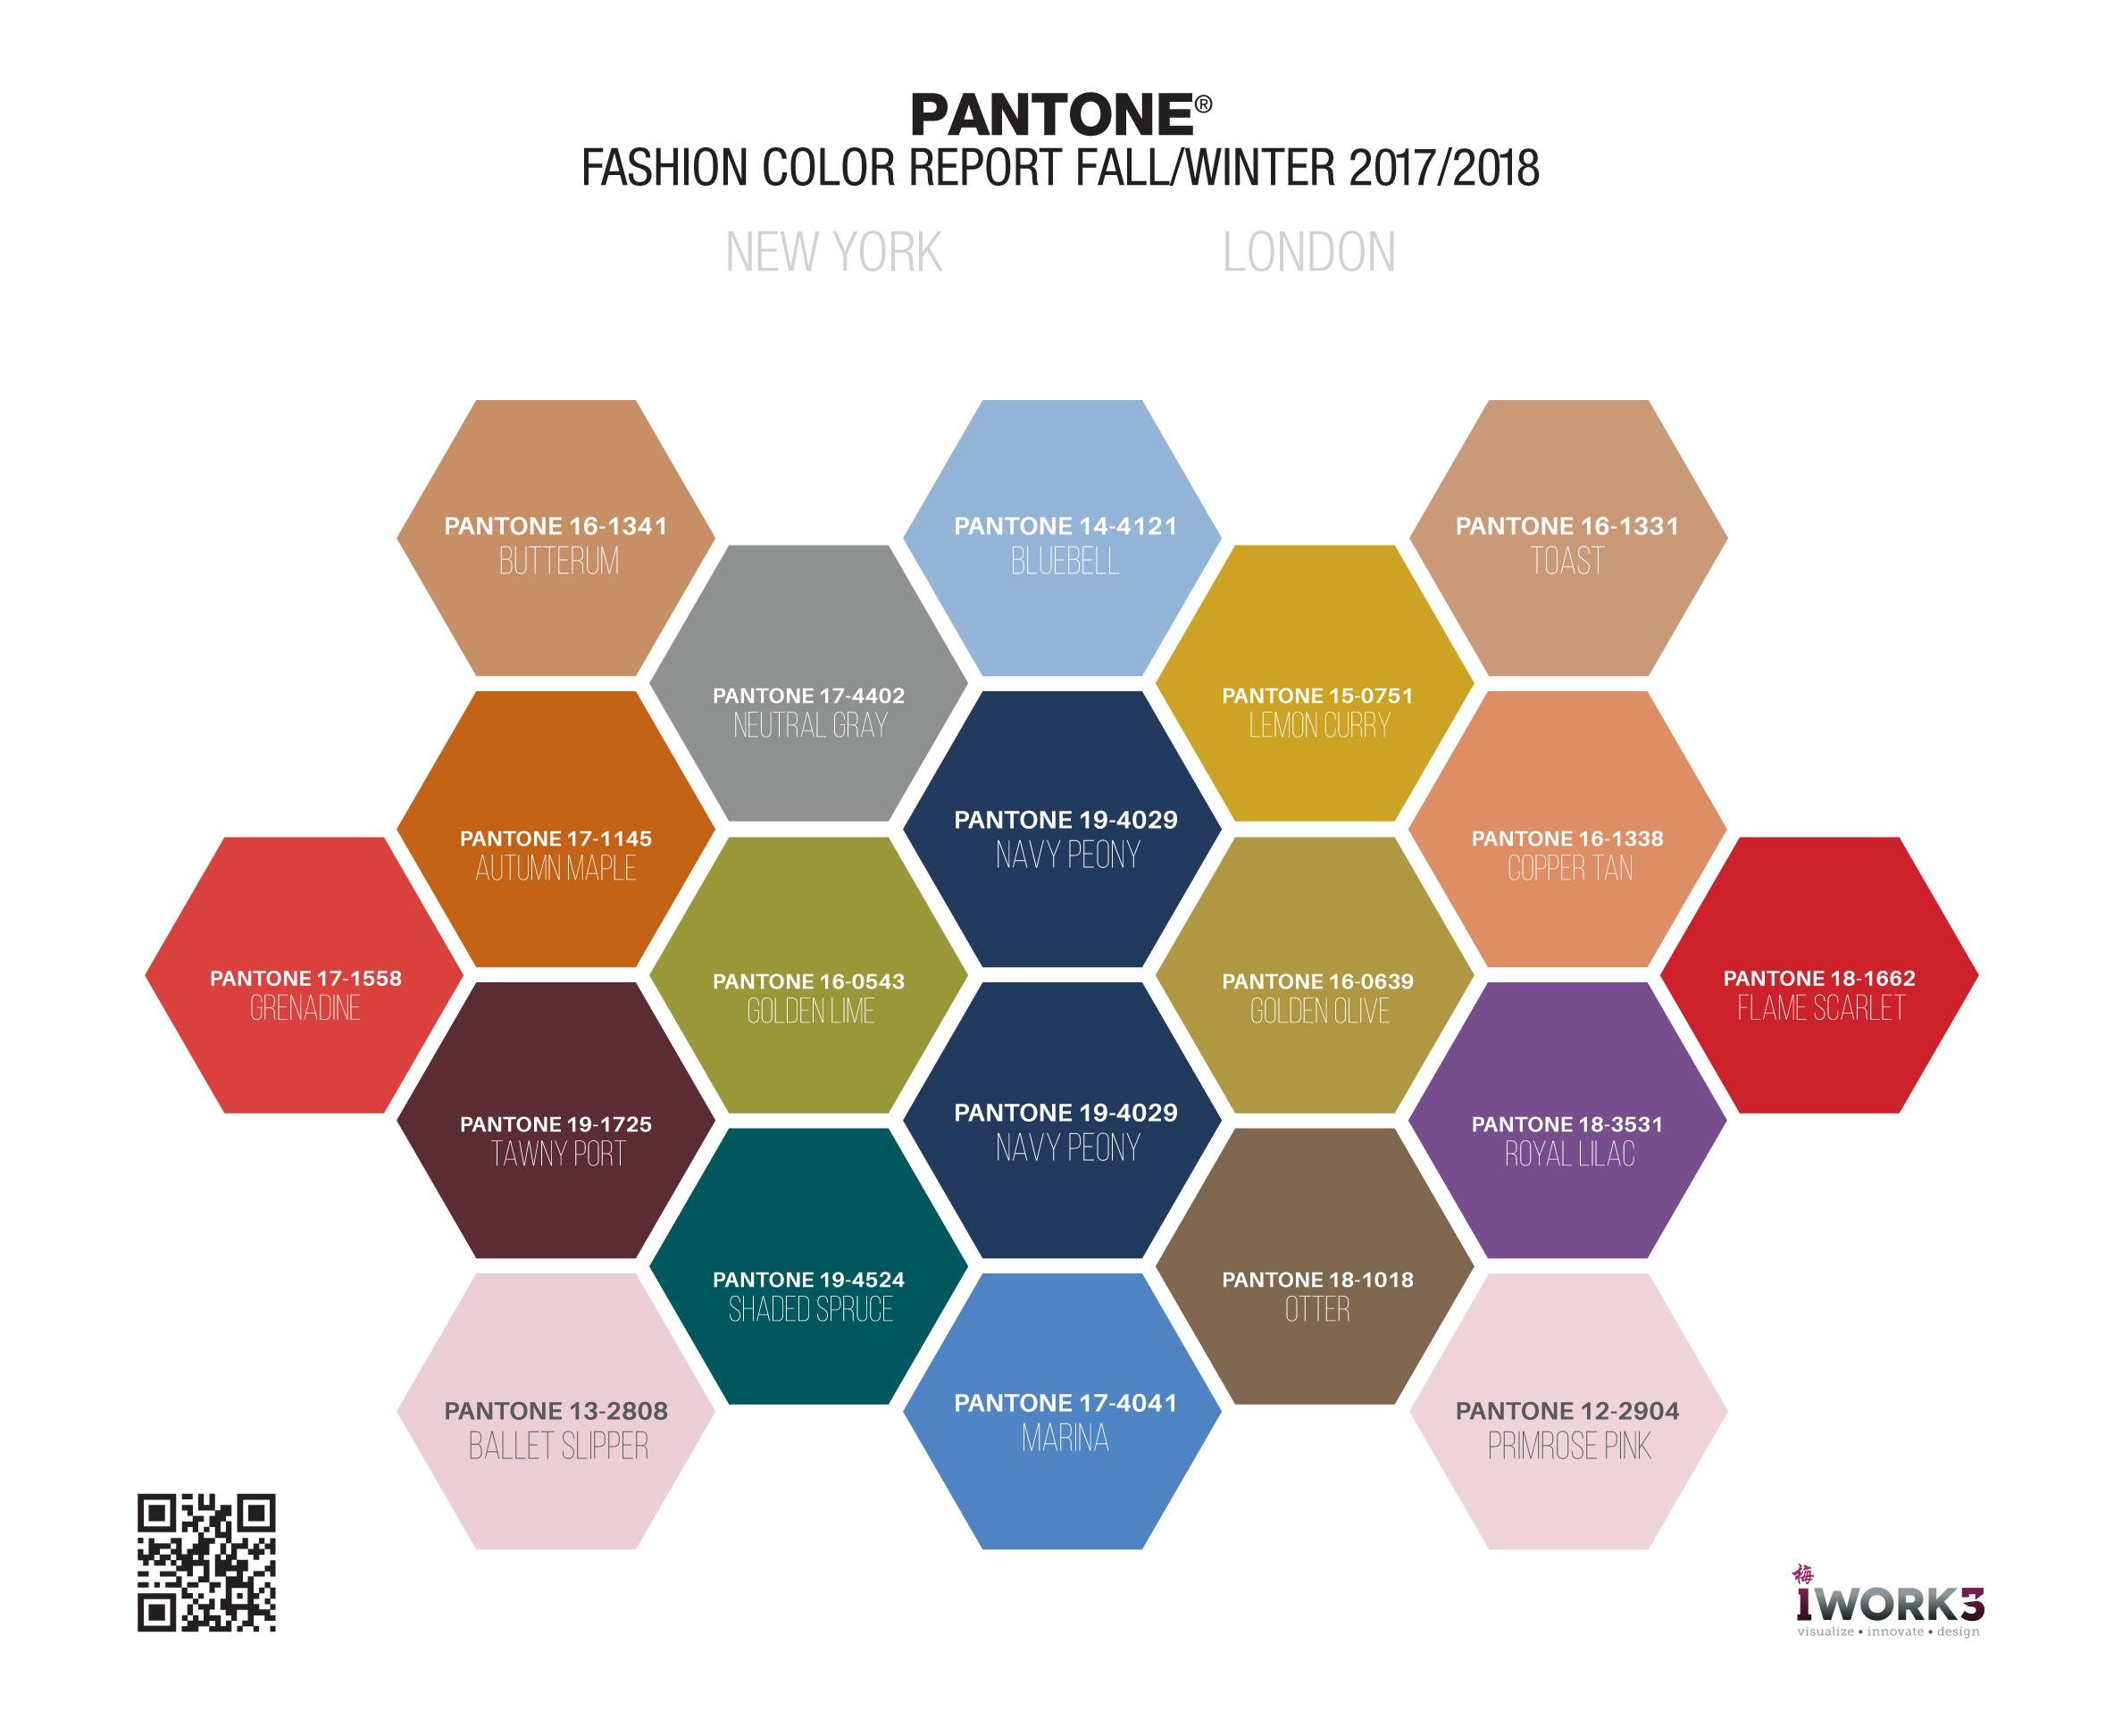 PANTONE Fashion Color Report: Fall/Winter 2017/2018 ...